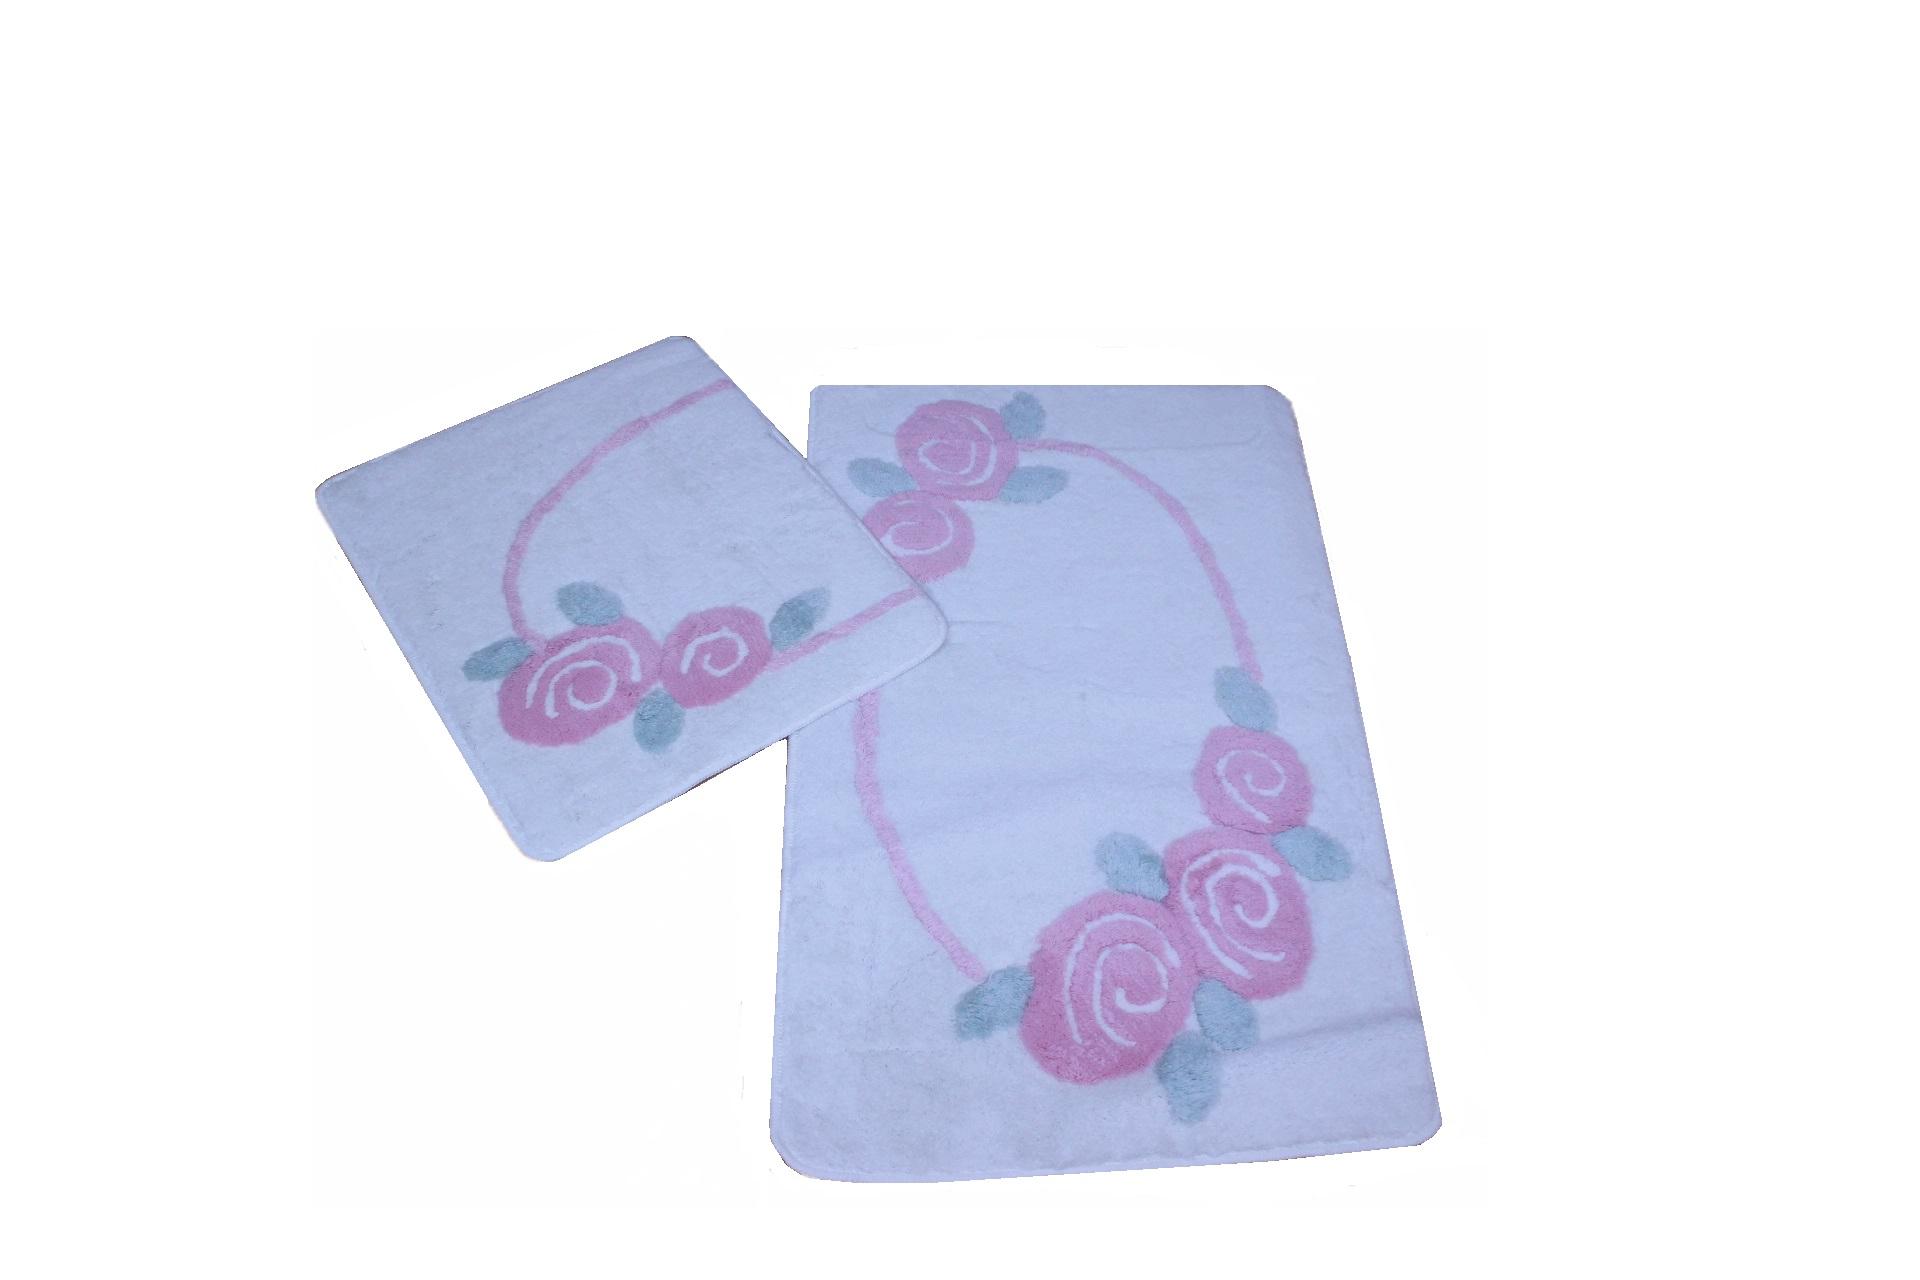 Коврики для ванной  туалета DO'n'CO    Roselin Цвет: Розовый (60х100 см,50х60 )